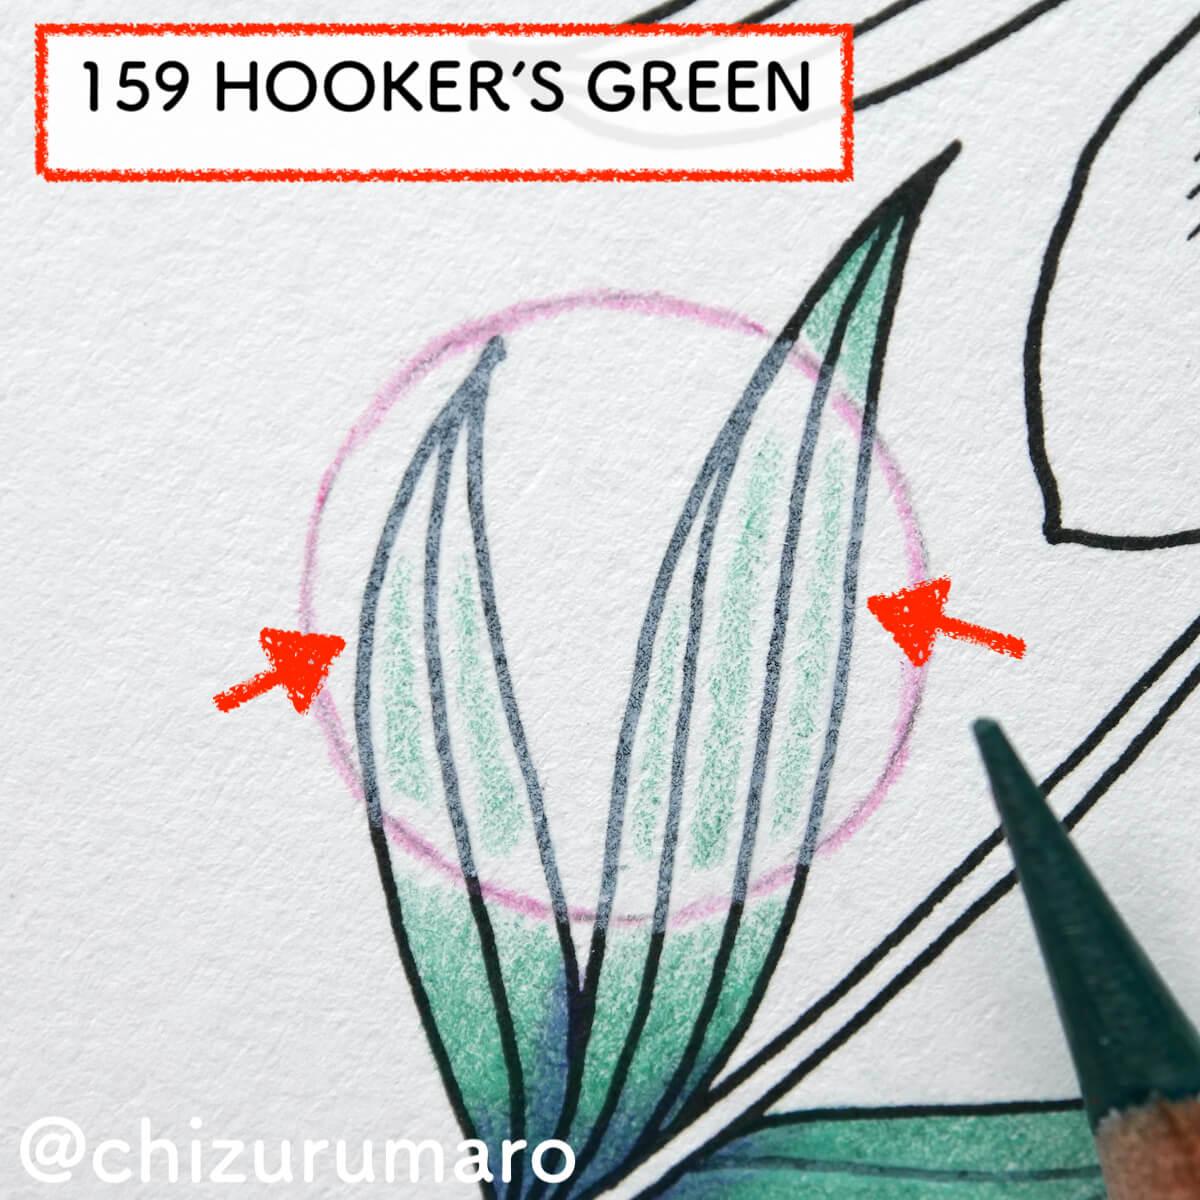 f:id:chizurumaro:20210819130120j:plain